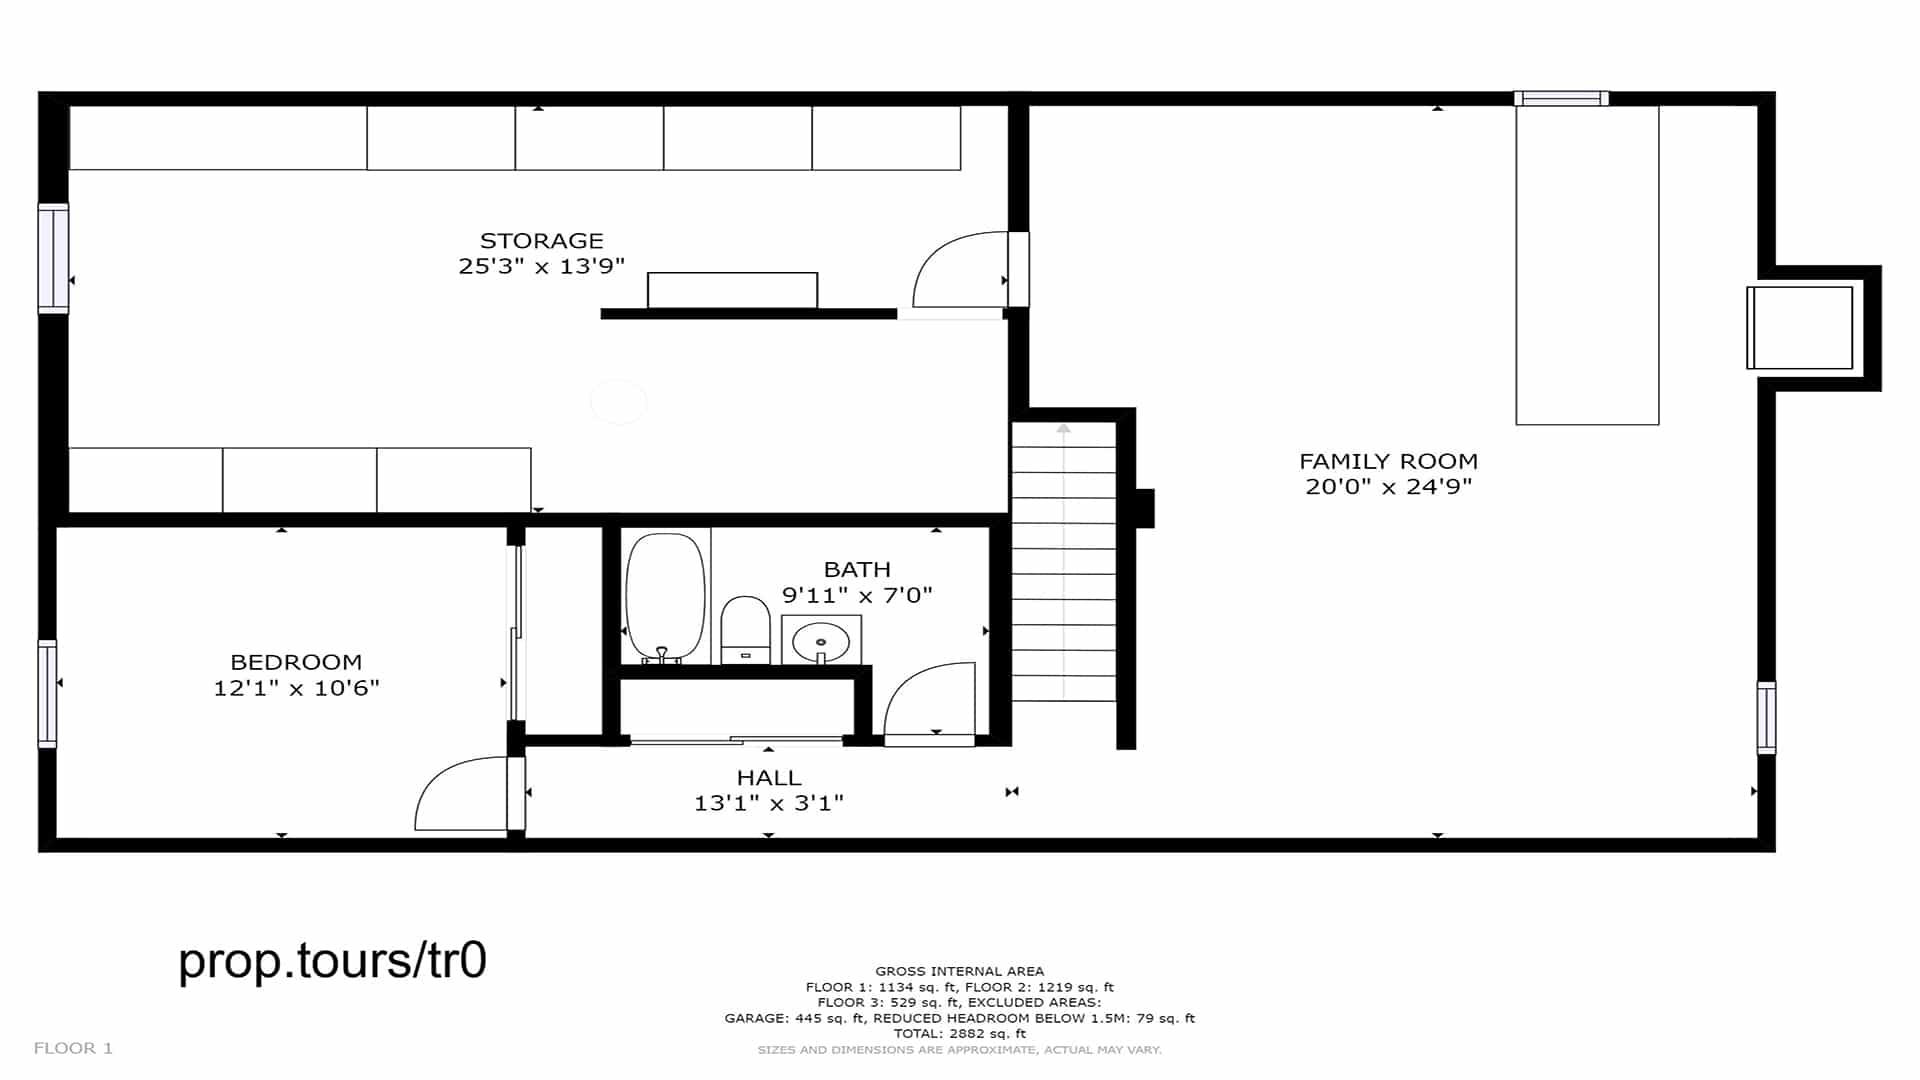 Brighton home for sale, basement floor plan